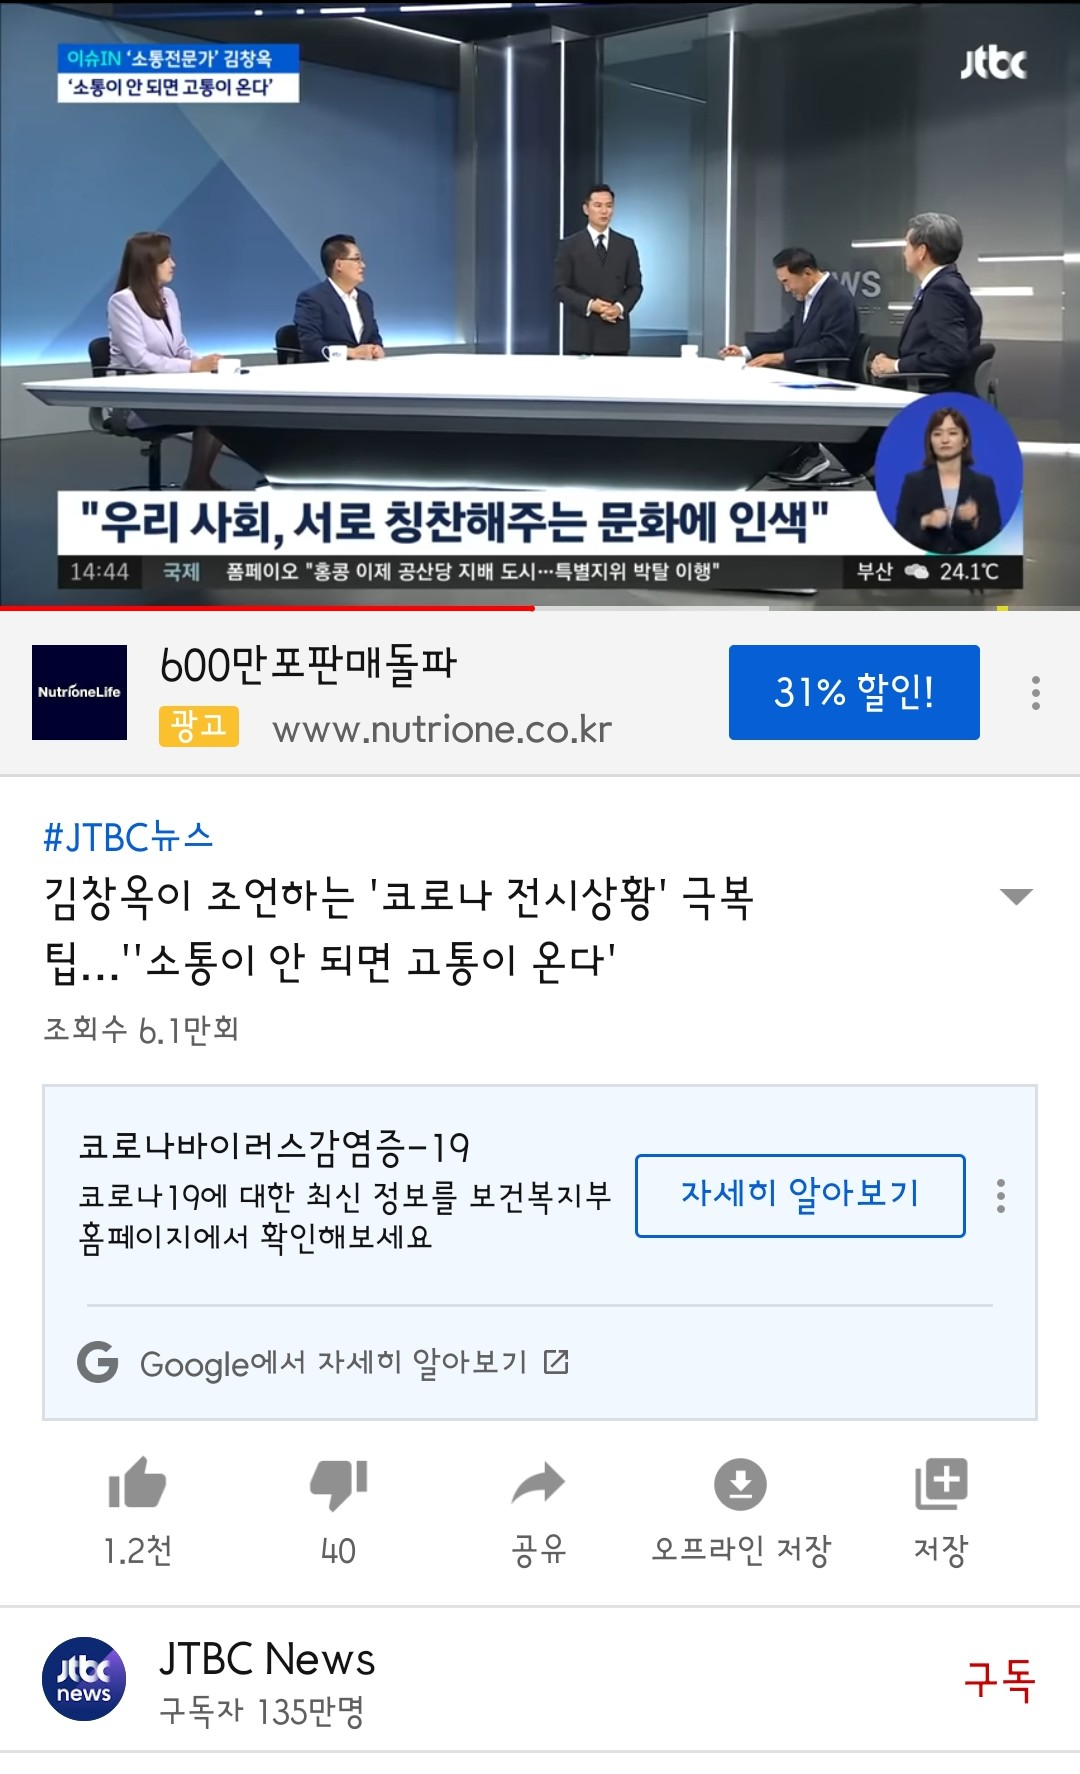 jtbc 김창옥의 미니강연(10분짜리), 소통이 안 되면 고통이 온다. (7월 2일)